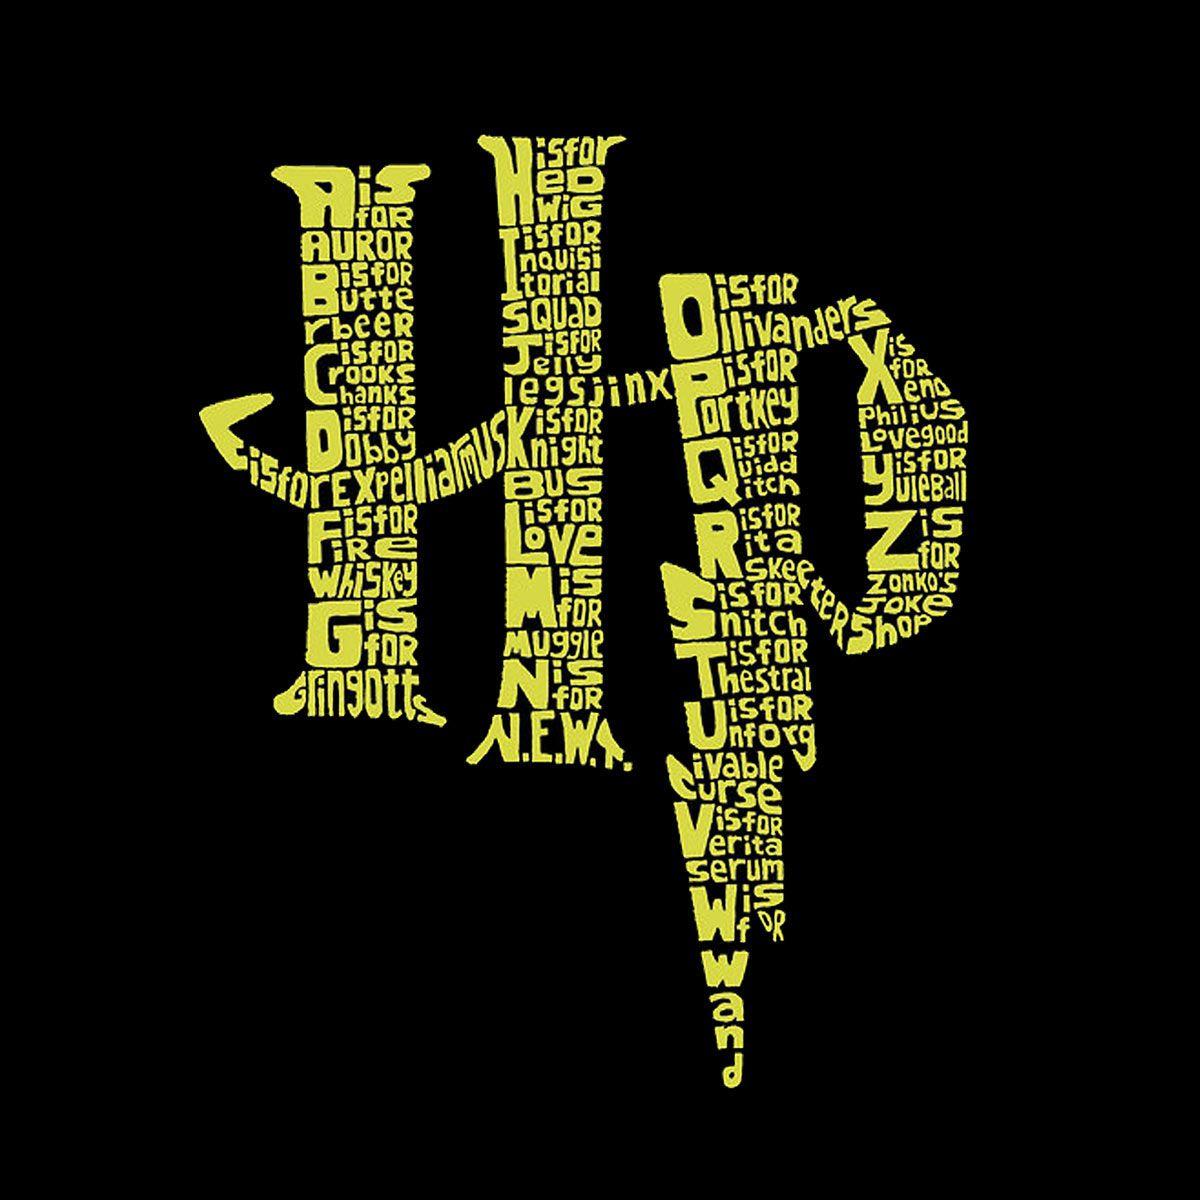 Top Wallpaper Harry Potter Childhood - 03f7f8c456a1625e876b6da1a6ed4520  You Should Have_229059.jpg